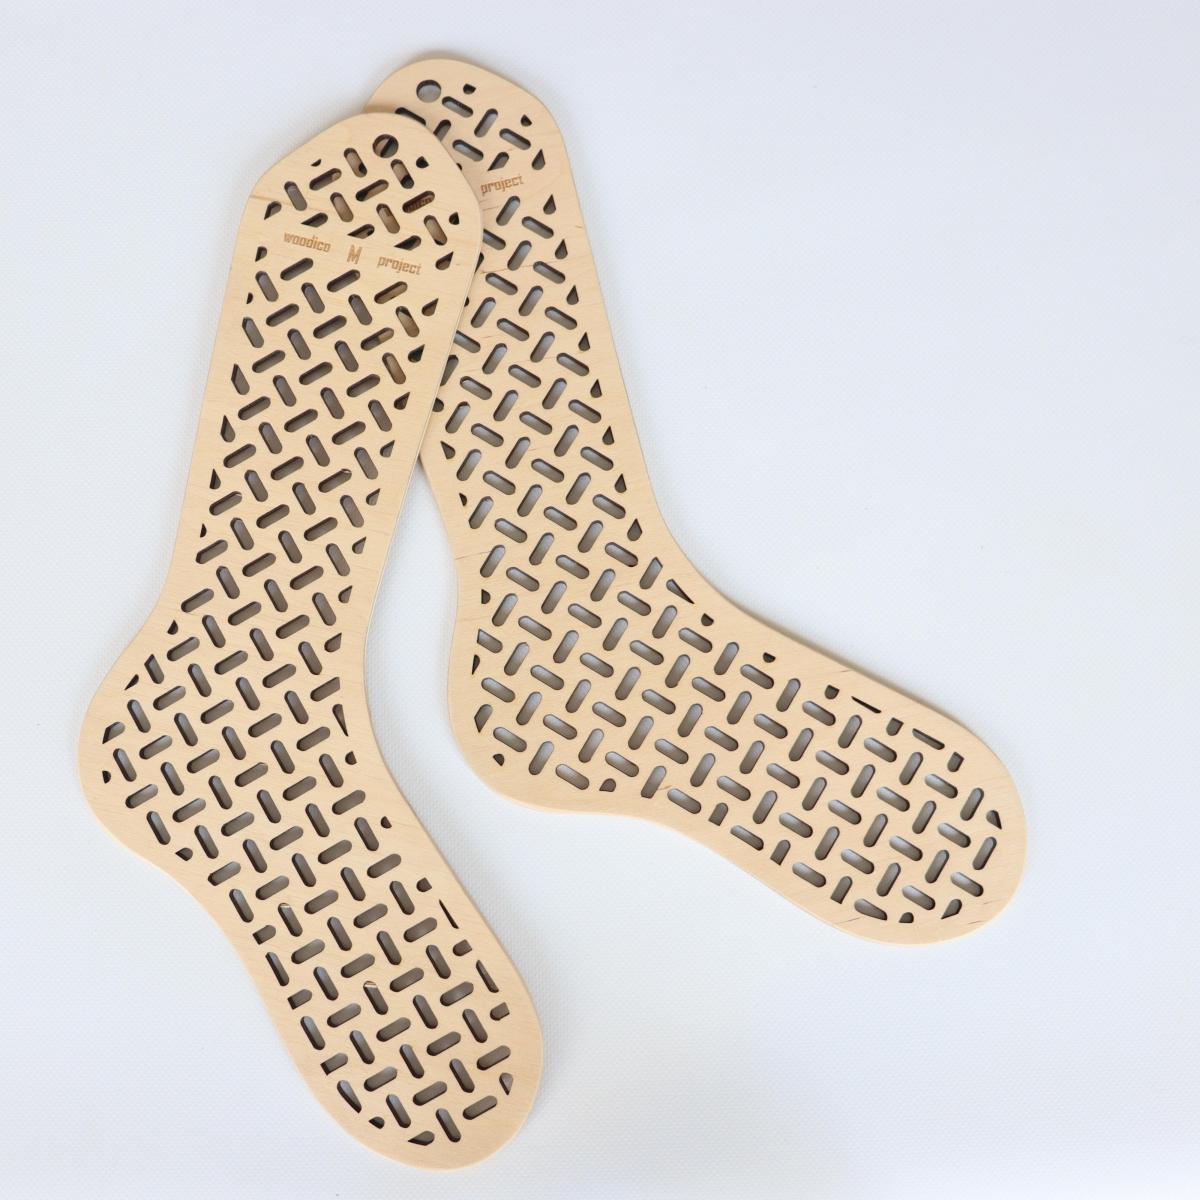 woodico.pro wooden sock blockers stitches 2 1200x1200 - Wooden sock blockers / Stitches